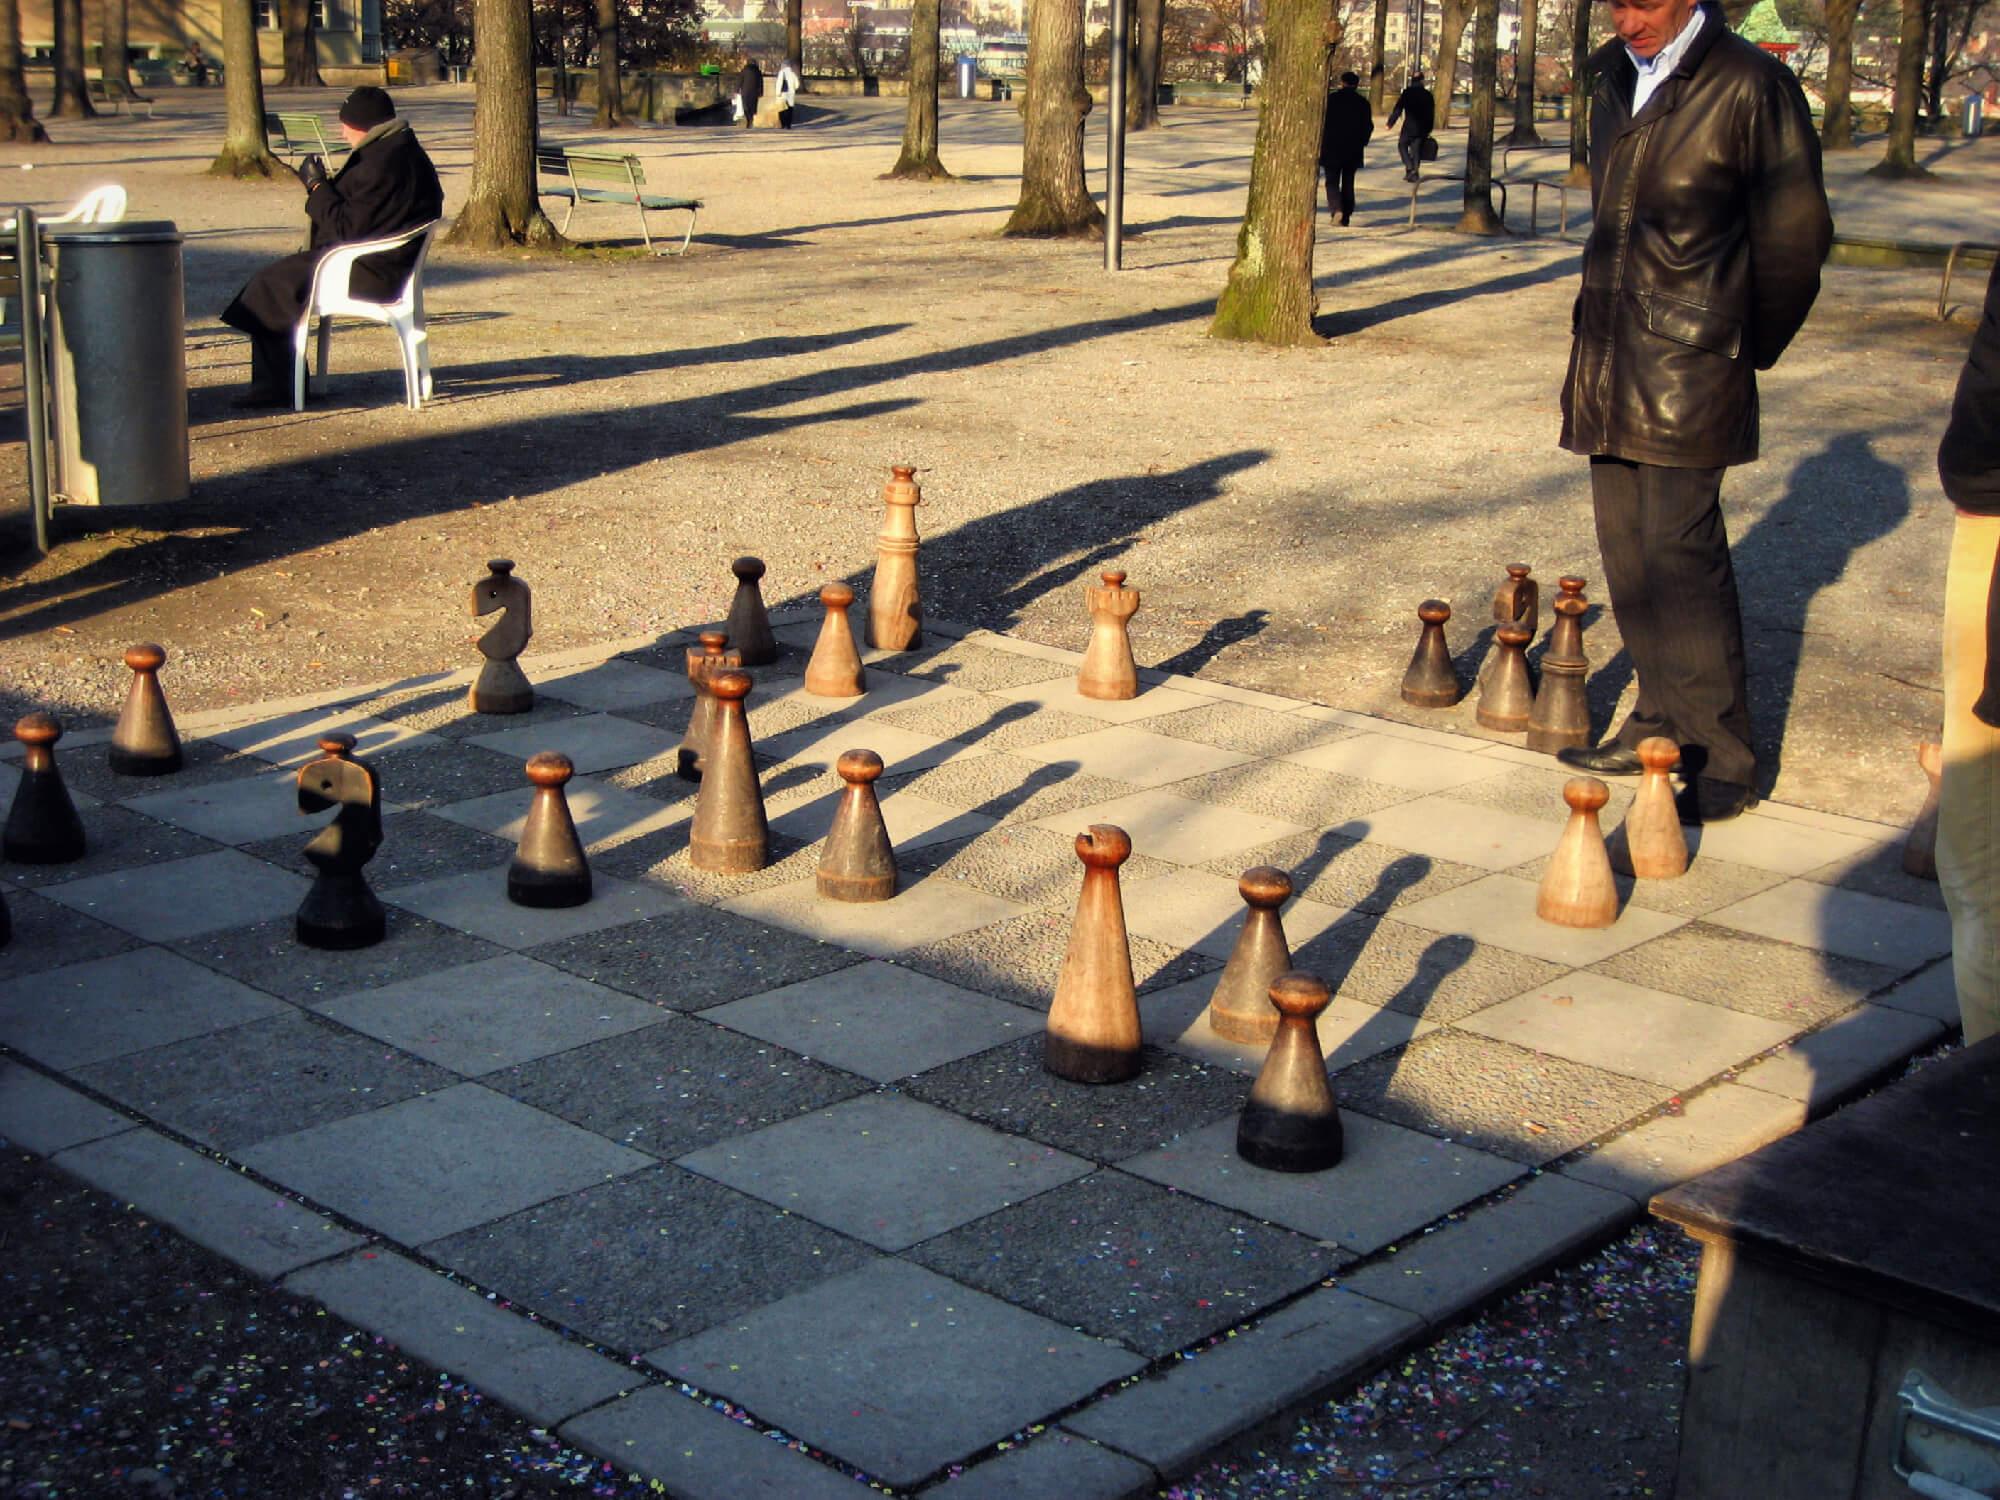 Fancy a game of chess in Lindenhofplatz?